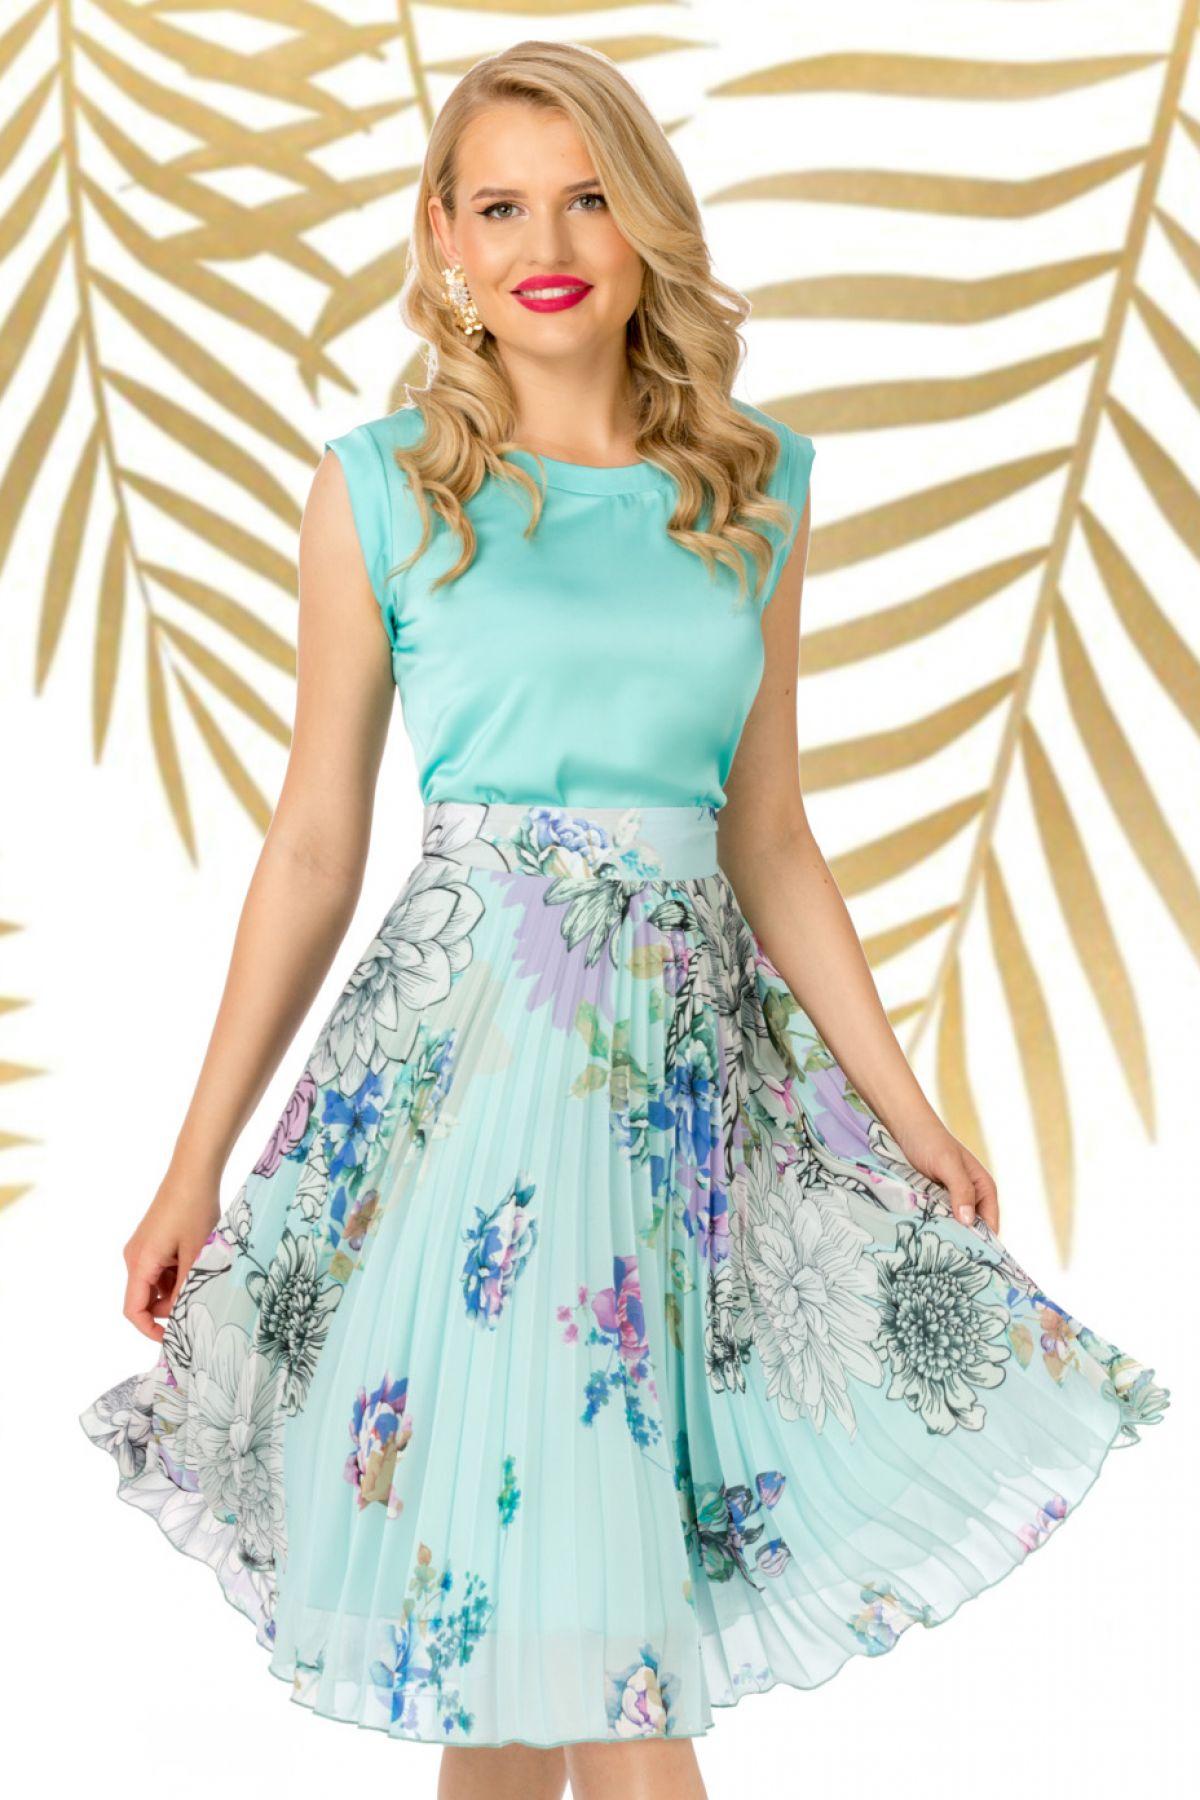 Fusta Pretty Girl plisata mint cu flori colorate